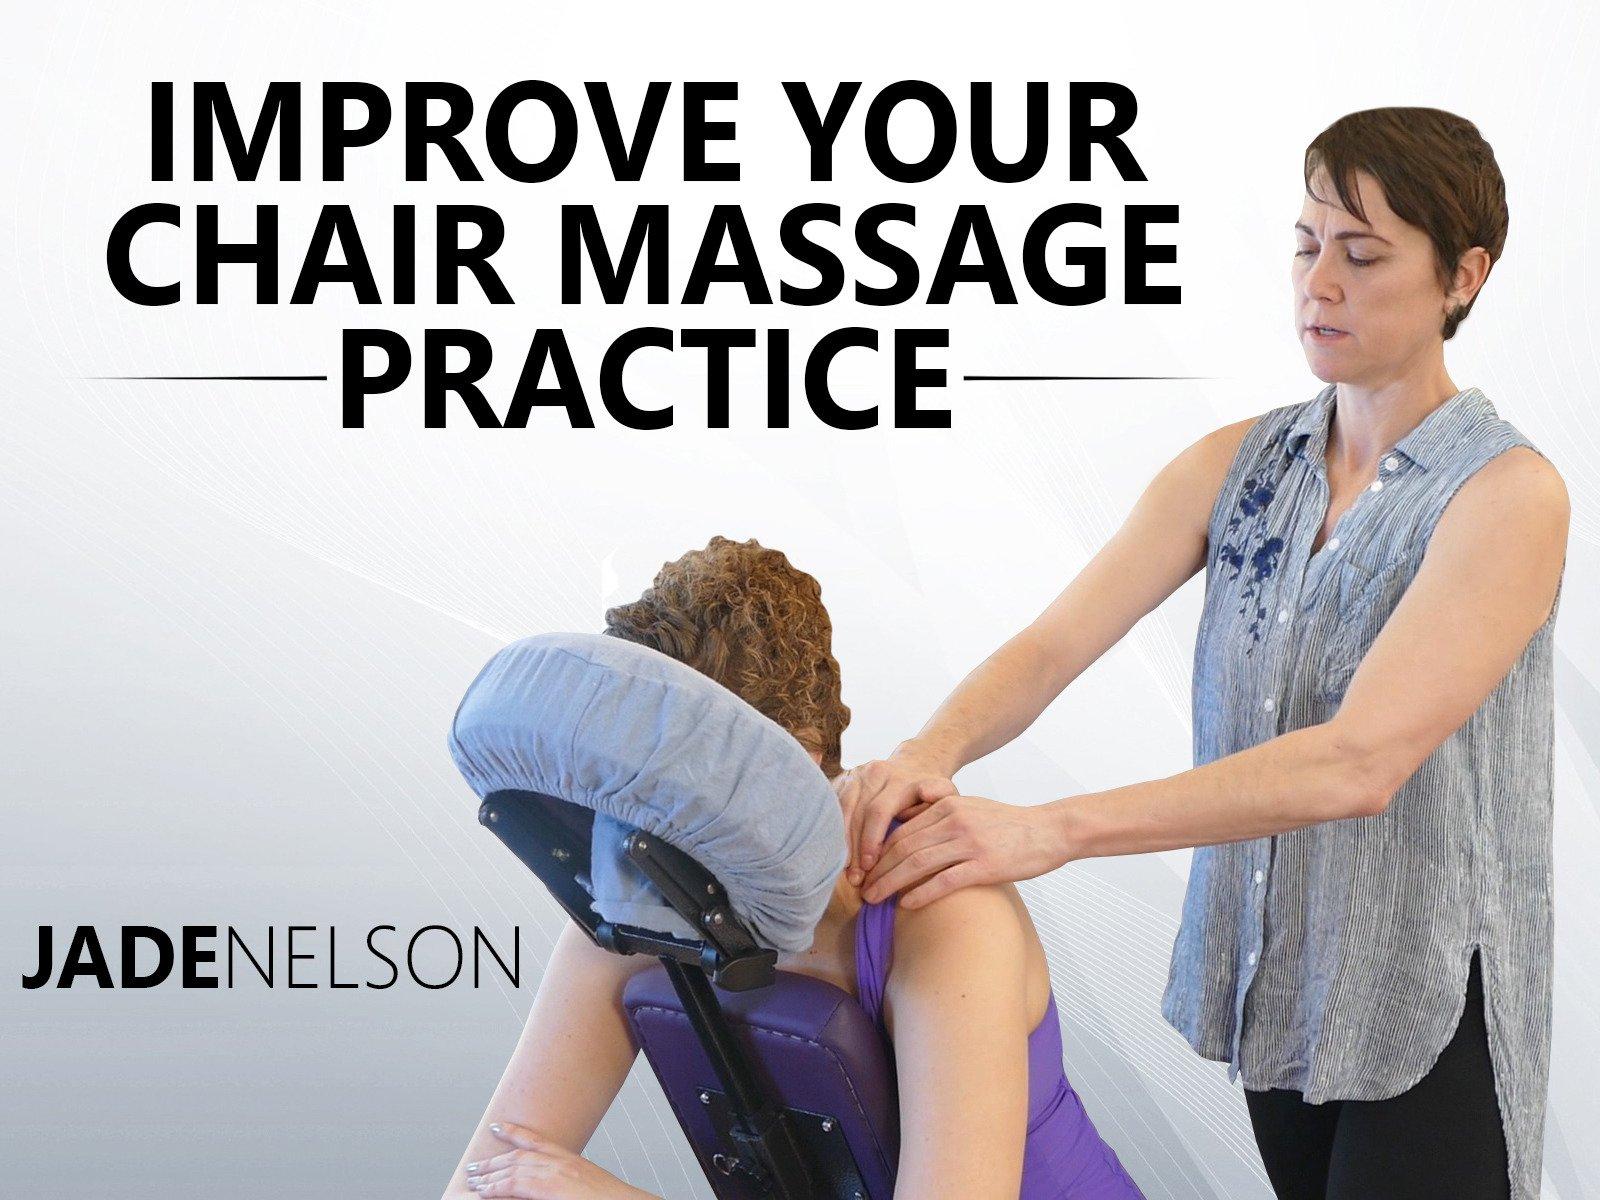 Improve Your Chair Massage Practice - Jade Nelson - Season 1